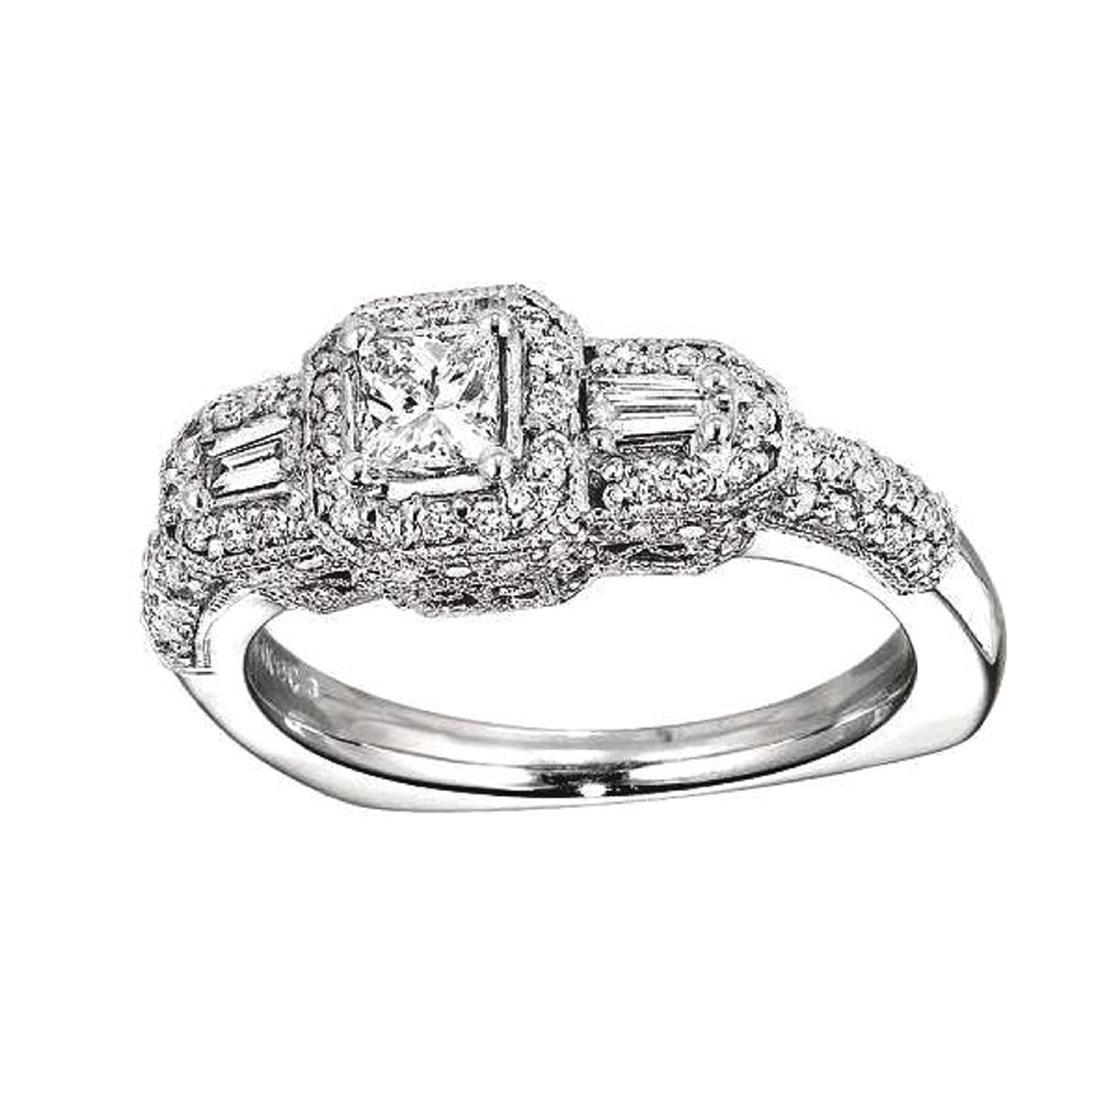 *Fine Jewelry, 14KT White Gold, 1.00CT Diamond